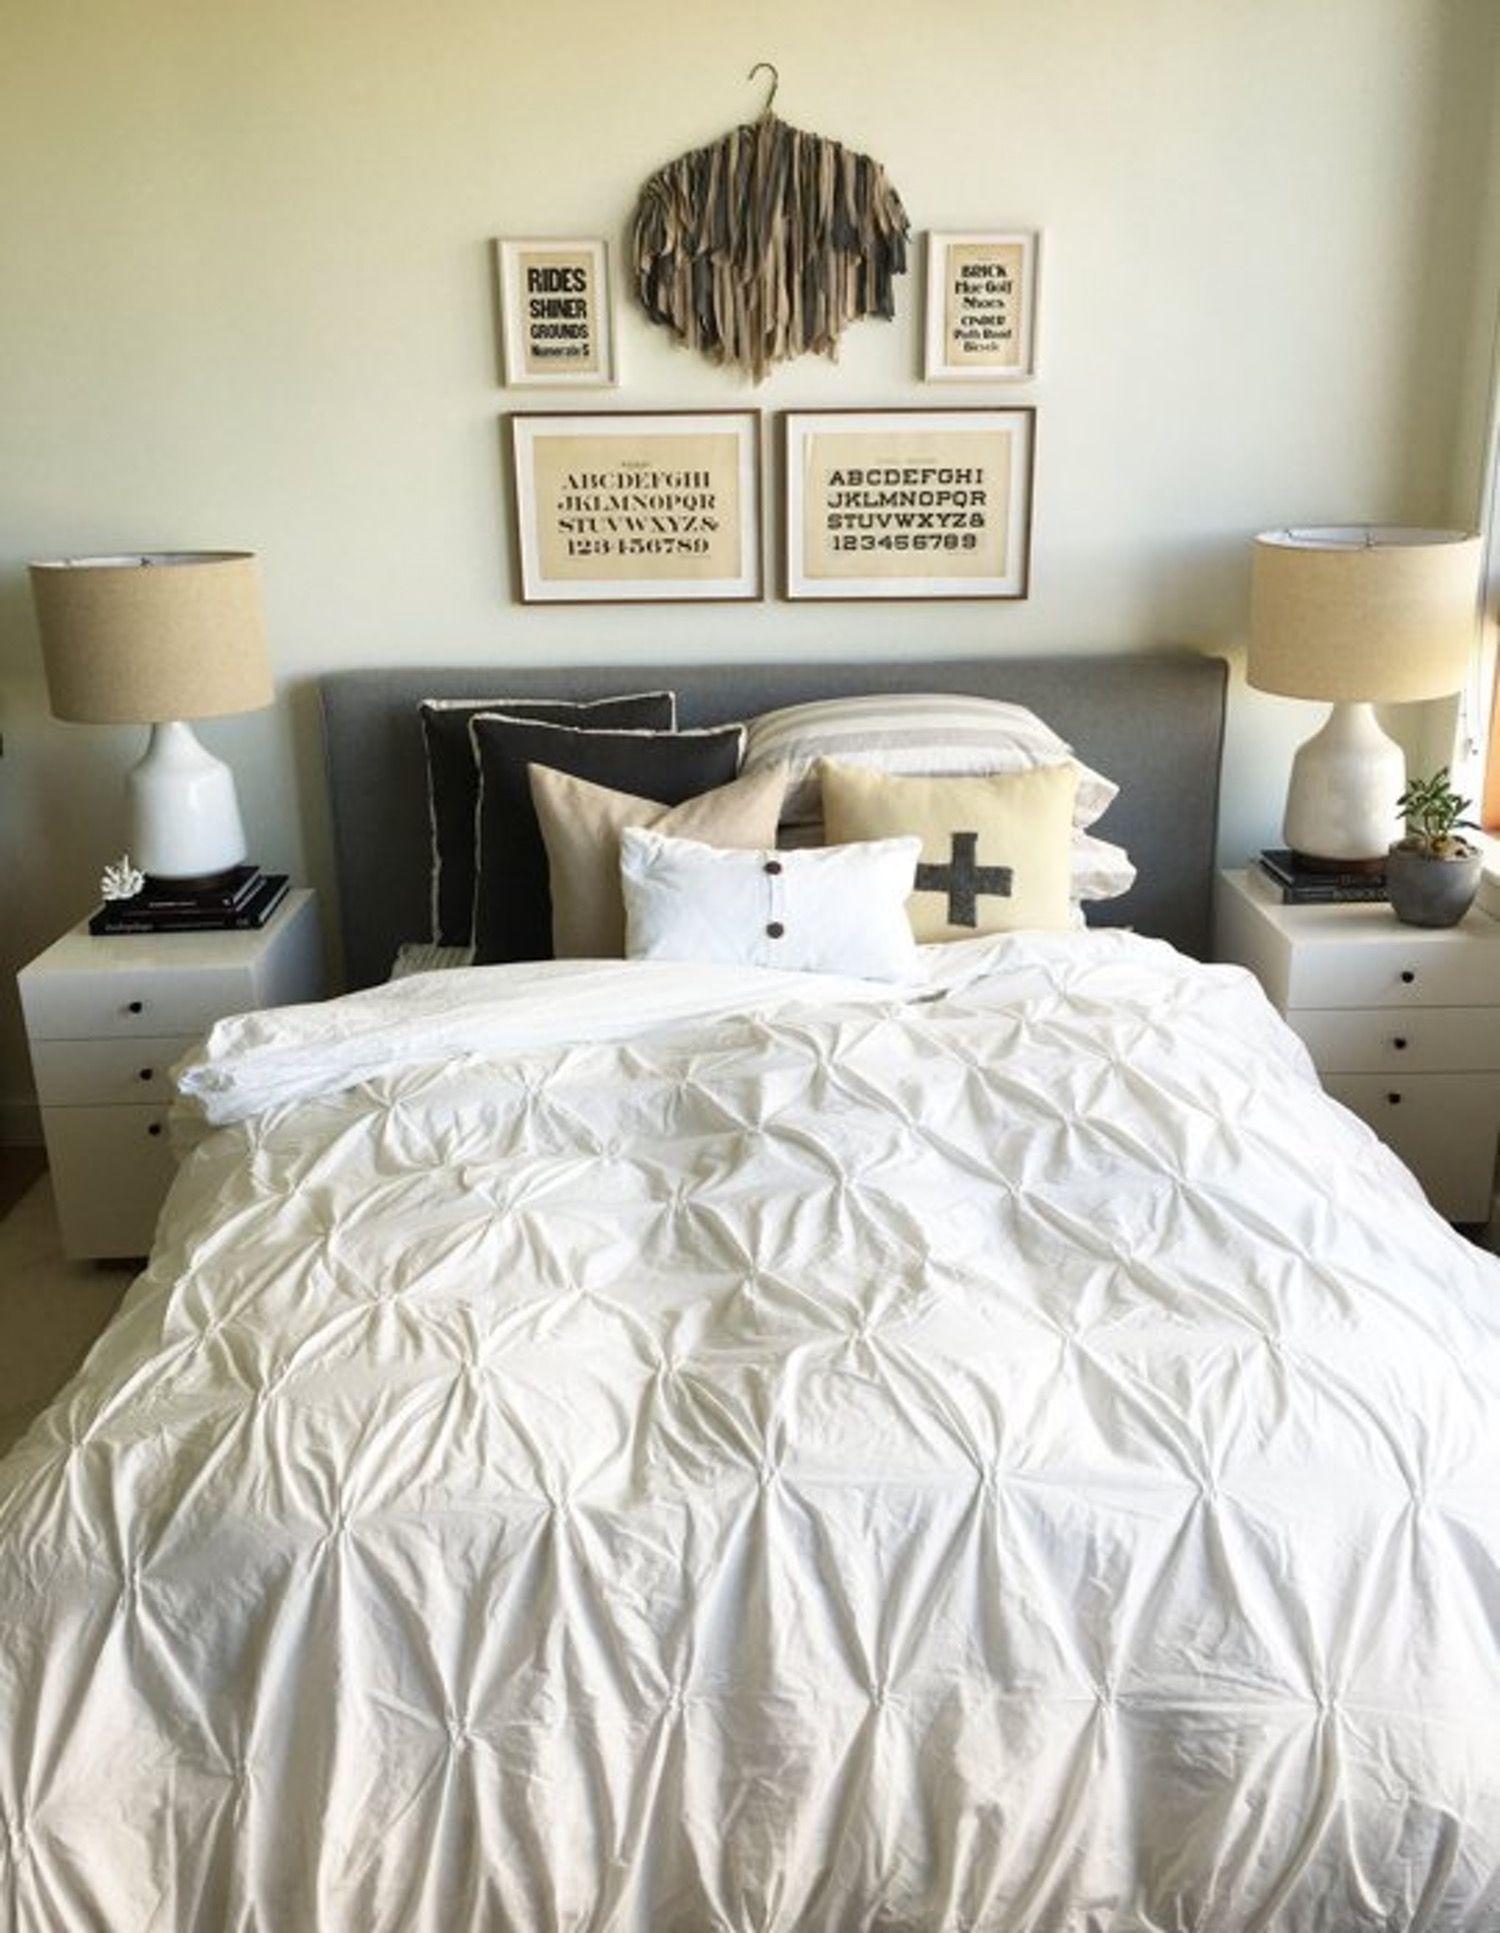 anna s cozy modern studio small cool bedroom interior on modern cozy bedroom decorating ideas id=22538